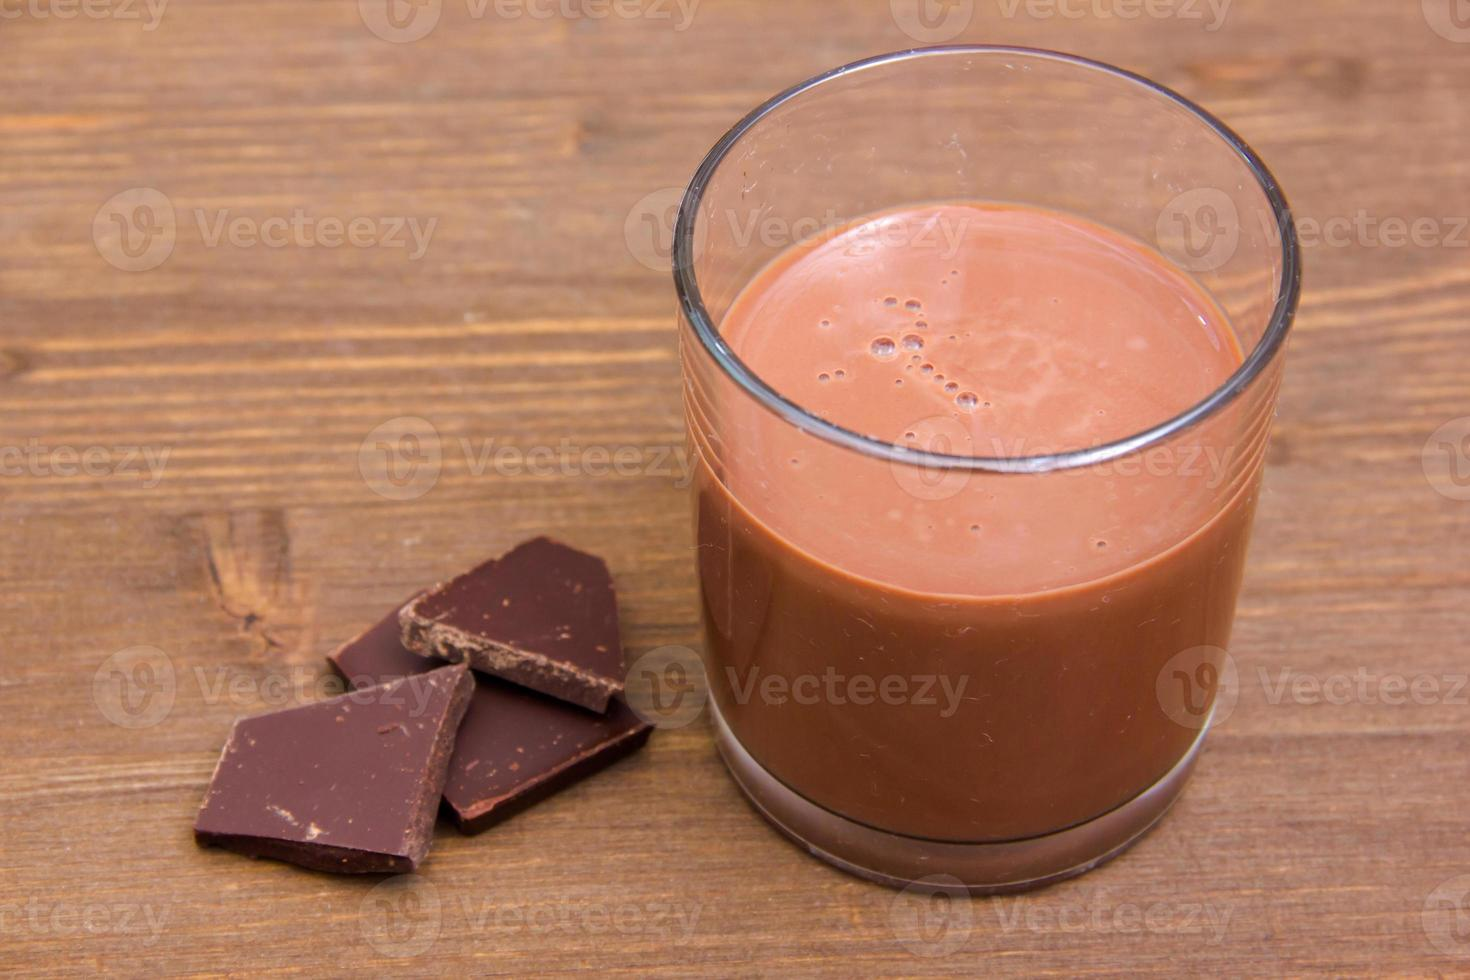 kakaodrink på trä foto